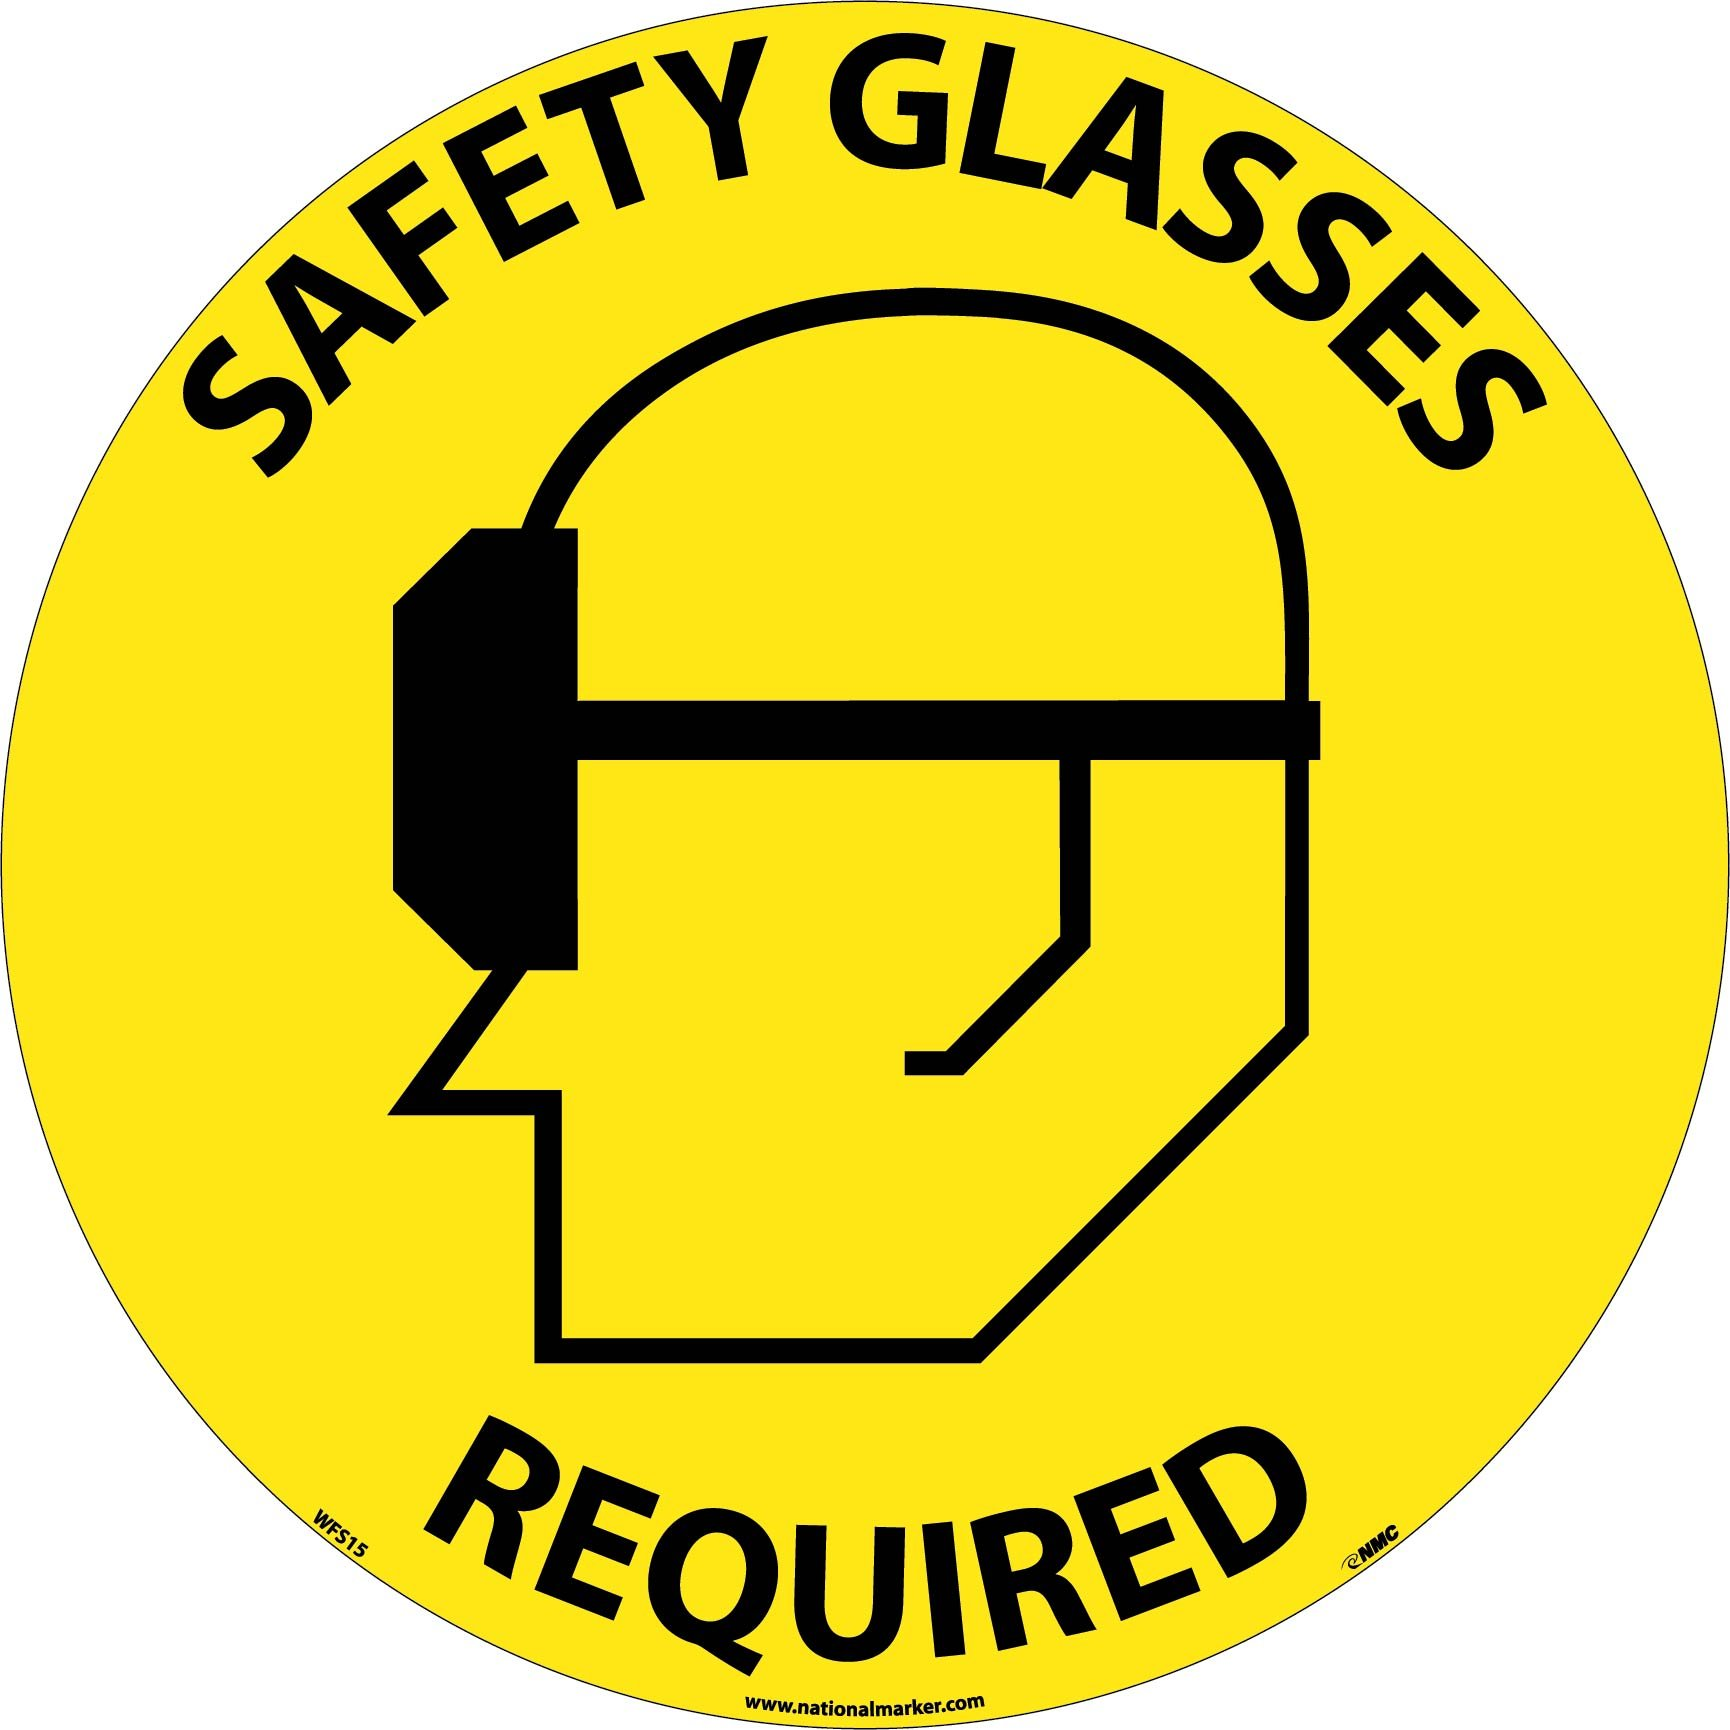 Free Scientist Glasses Cliparts Download Free Clip Art